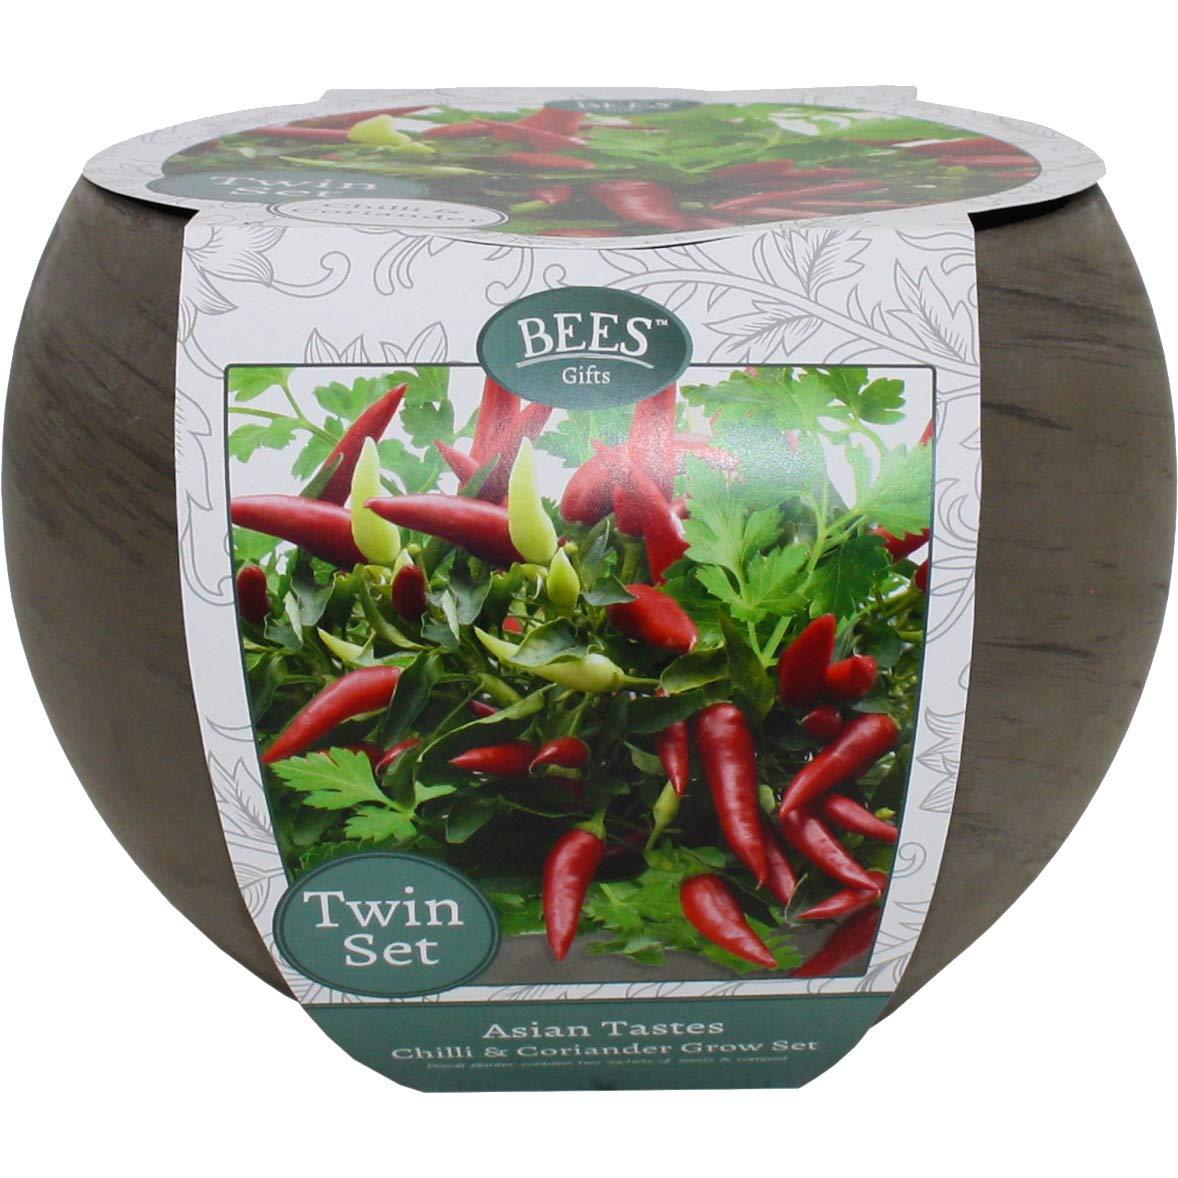 Asian Tastes Chilli and Coriander Grow Set